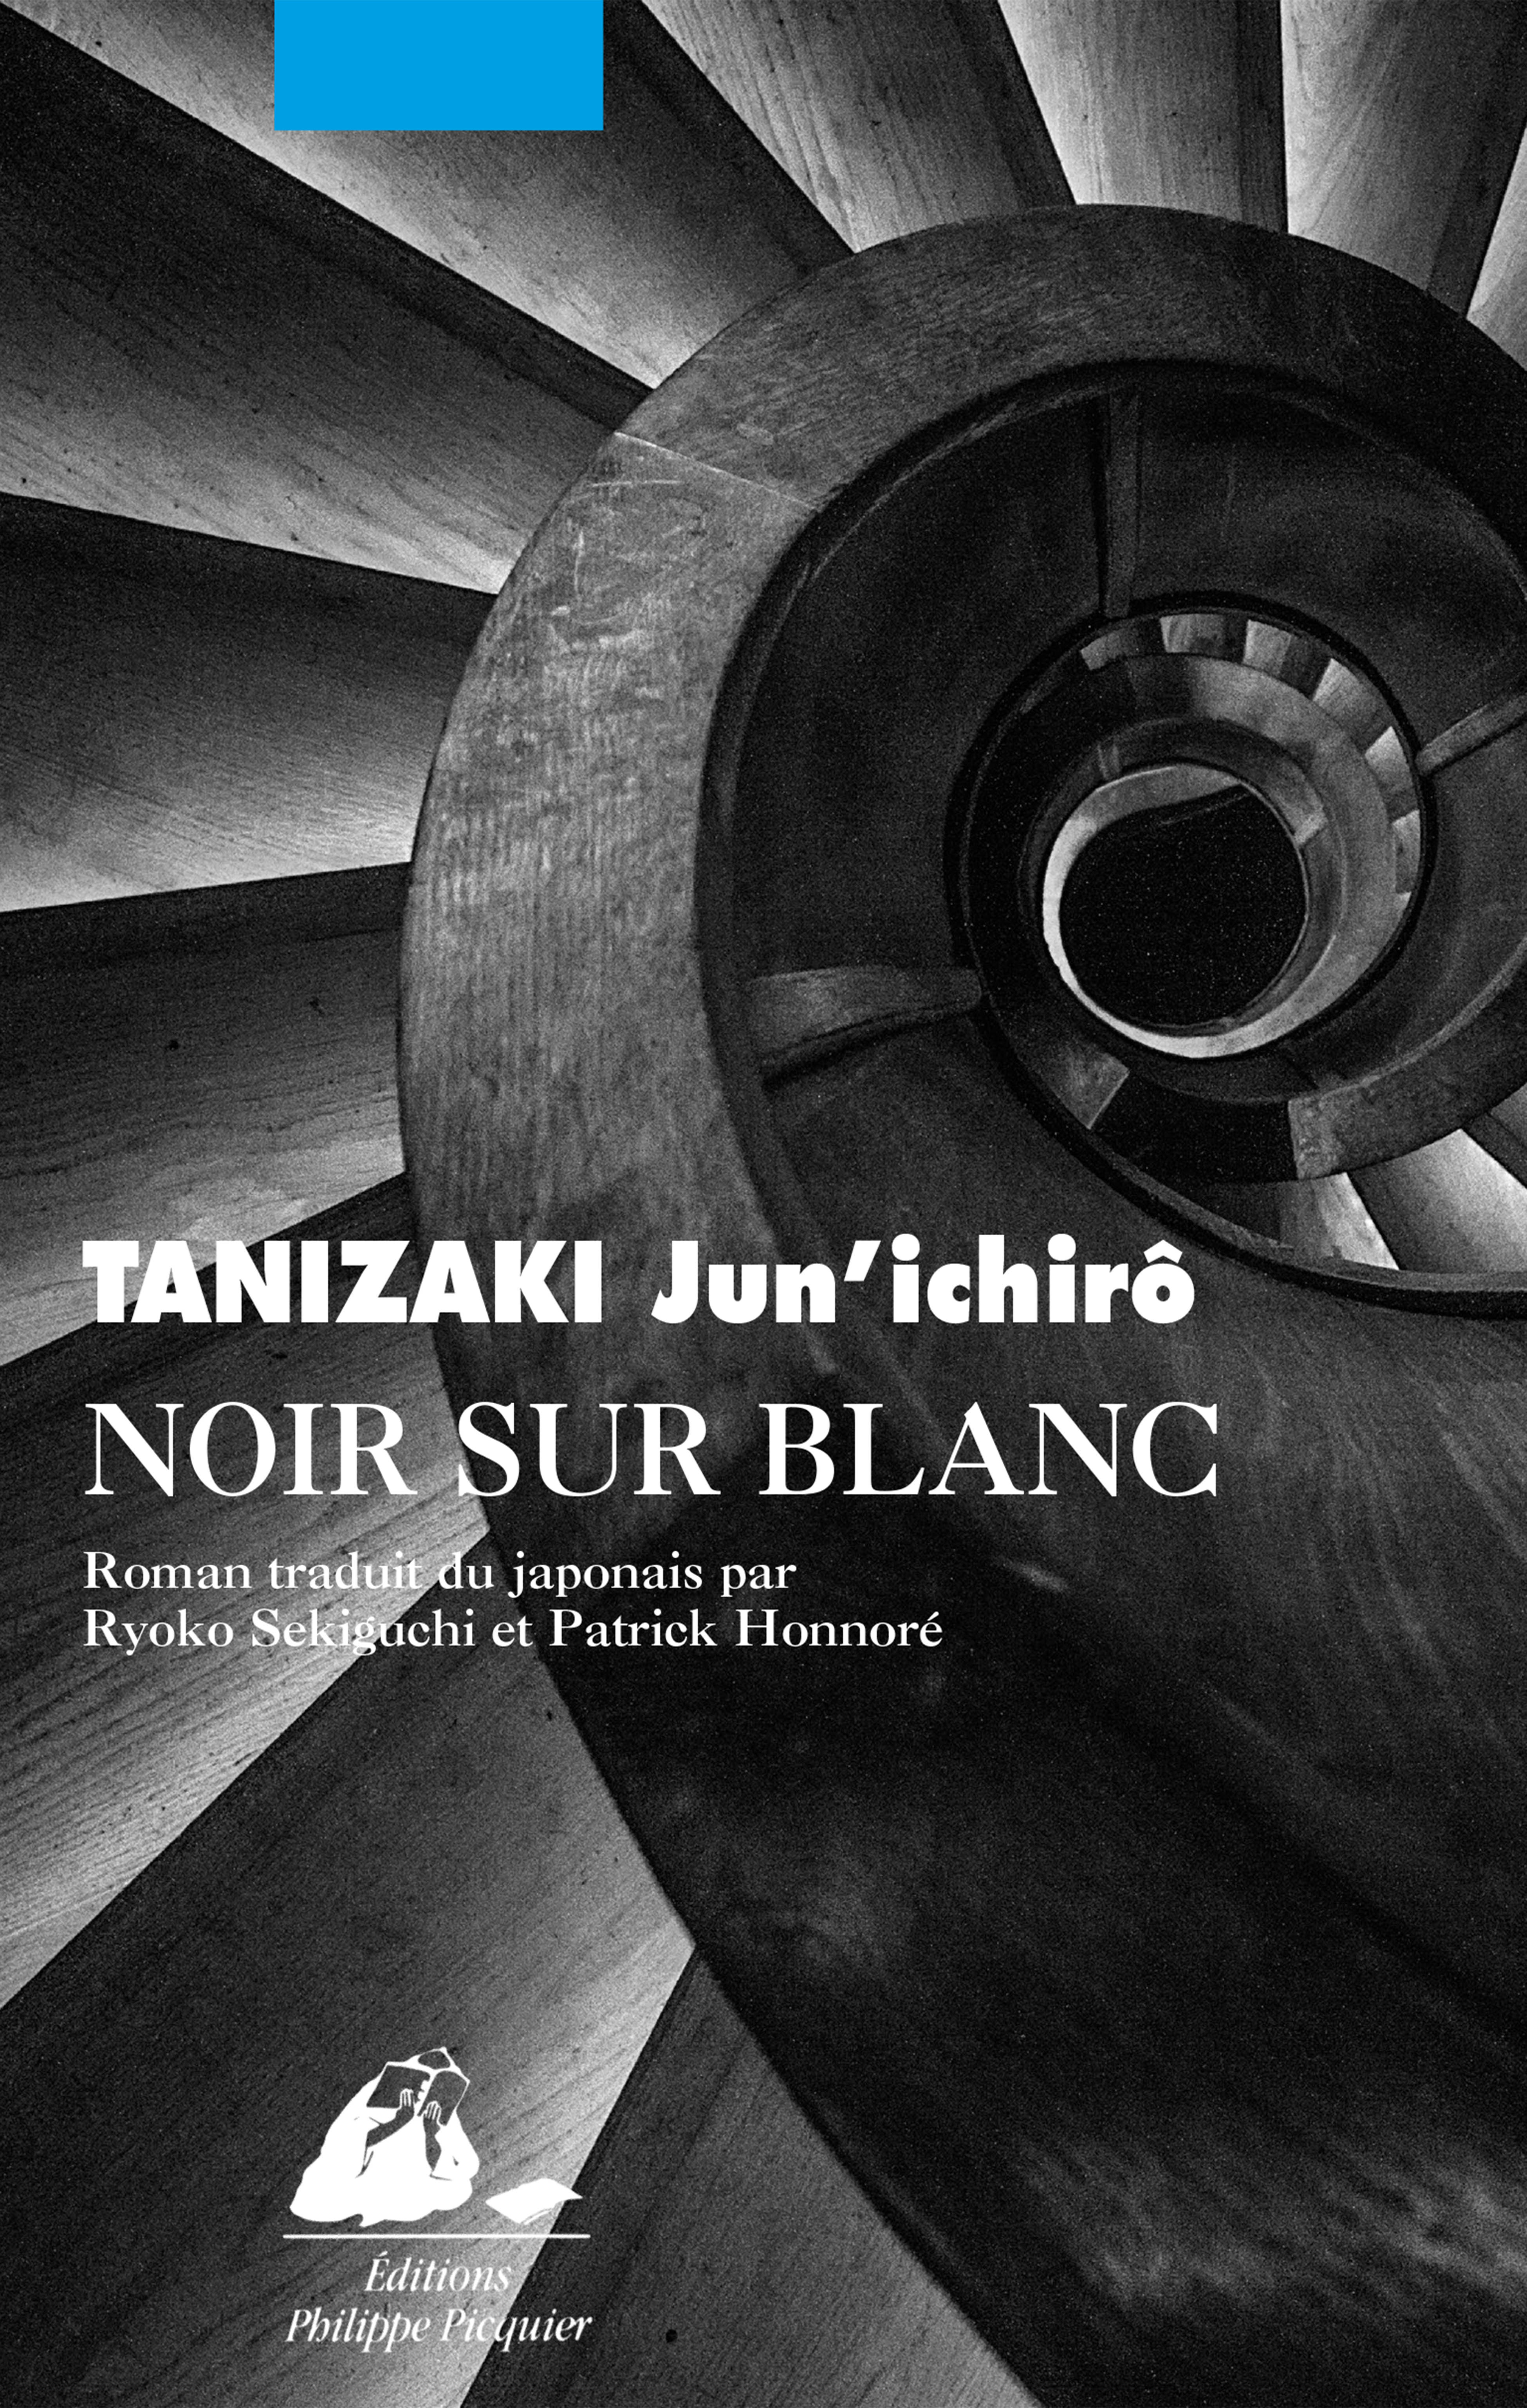 Noir sur blanc | TANIZAKI, Jun'ichiro